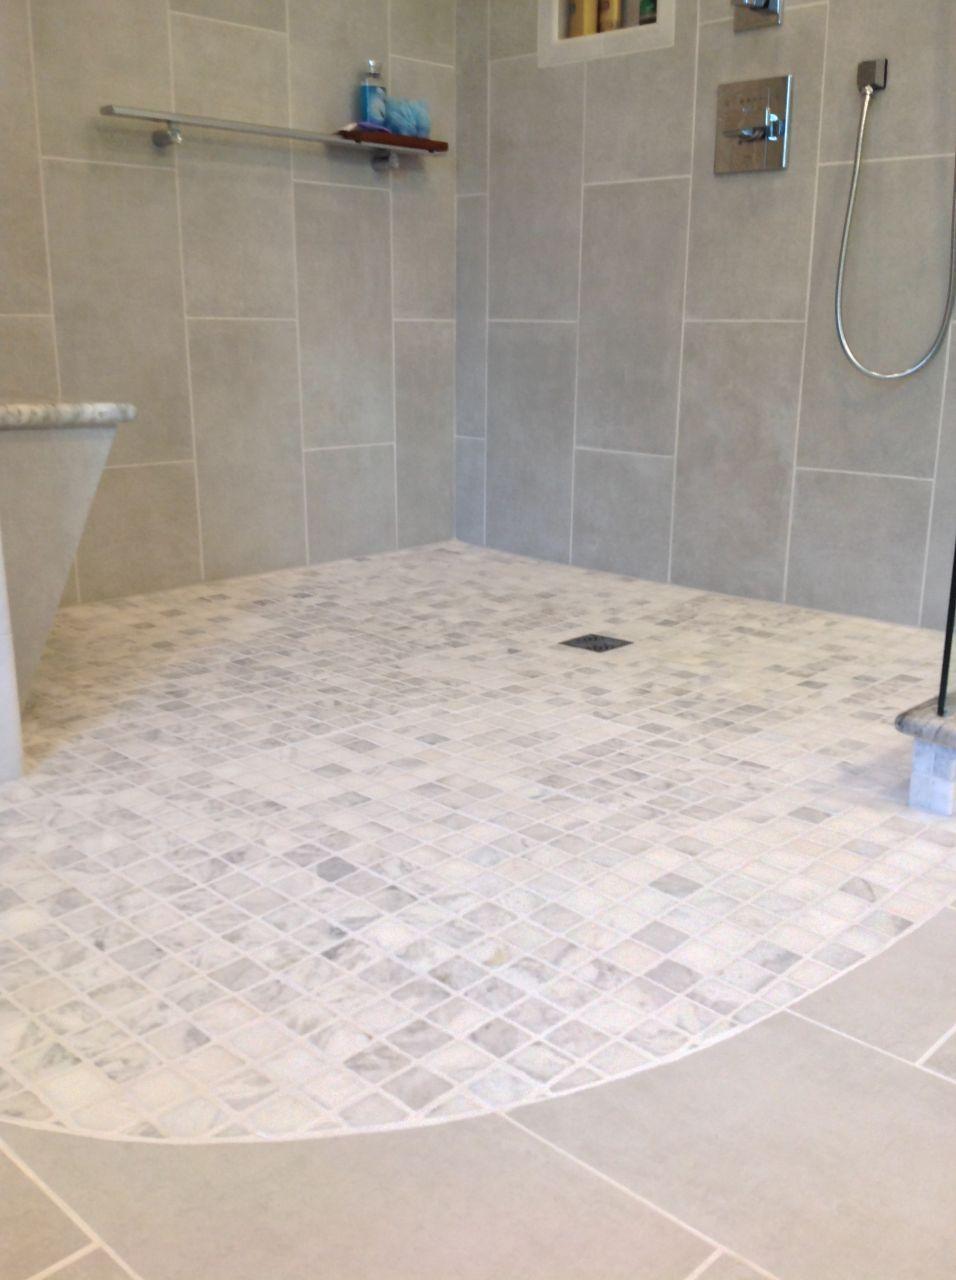 Open Design Bath Remodel In Cleveland Inspired By San Diego Hotel Bath Remodel Wet Rooms Bath Design